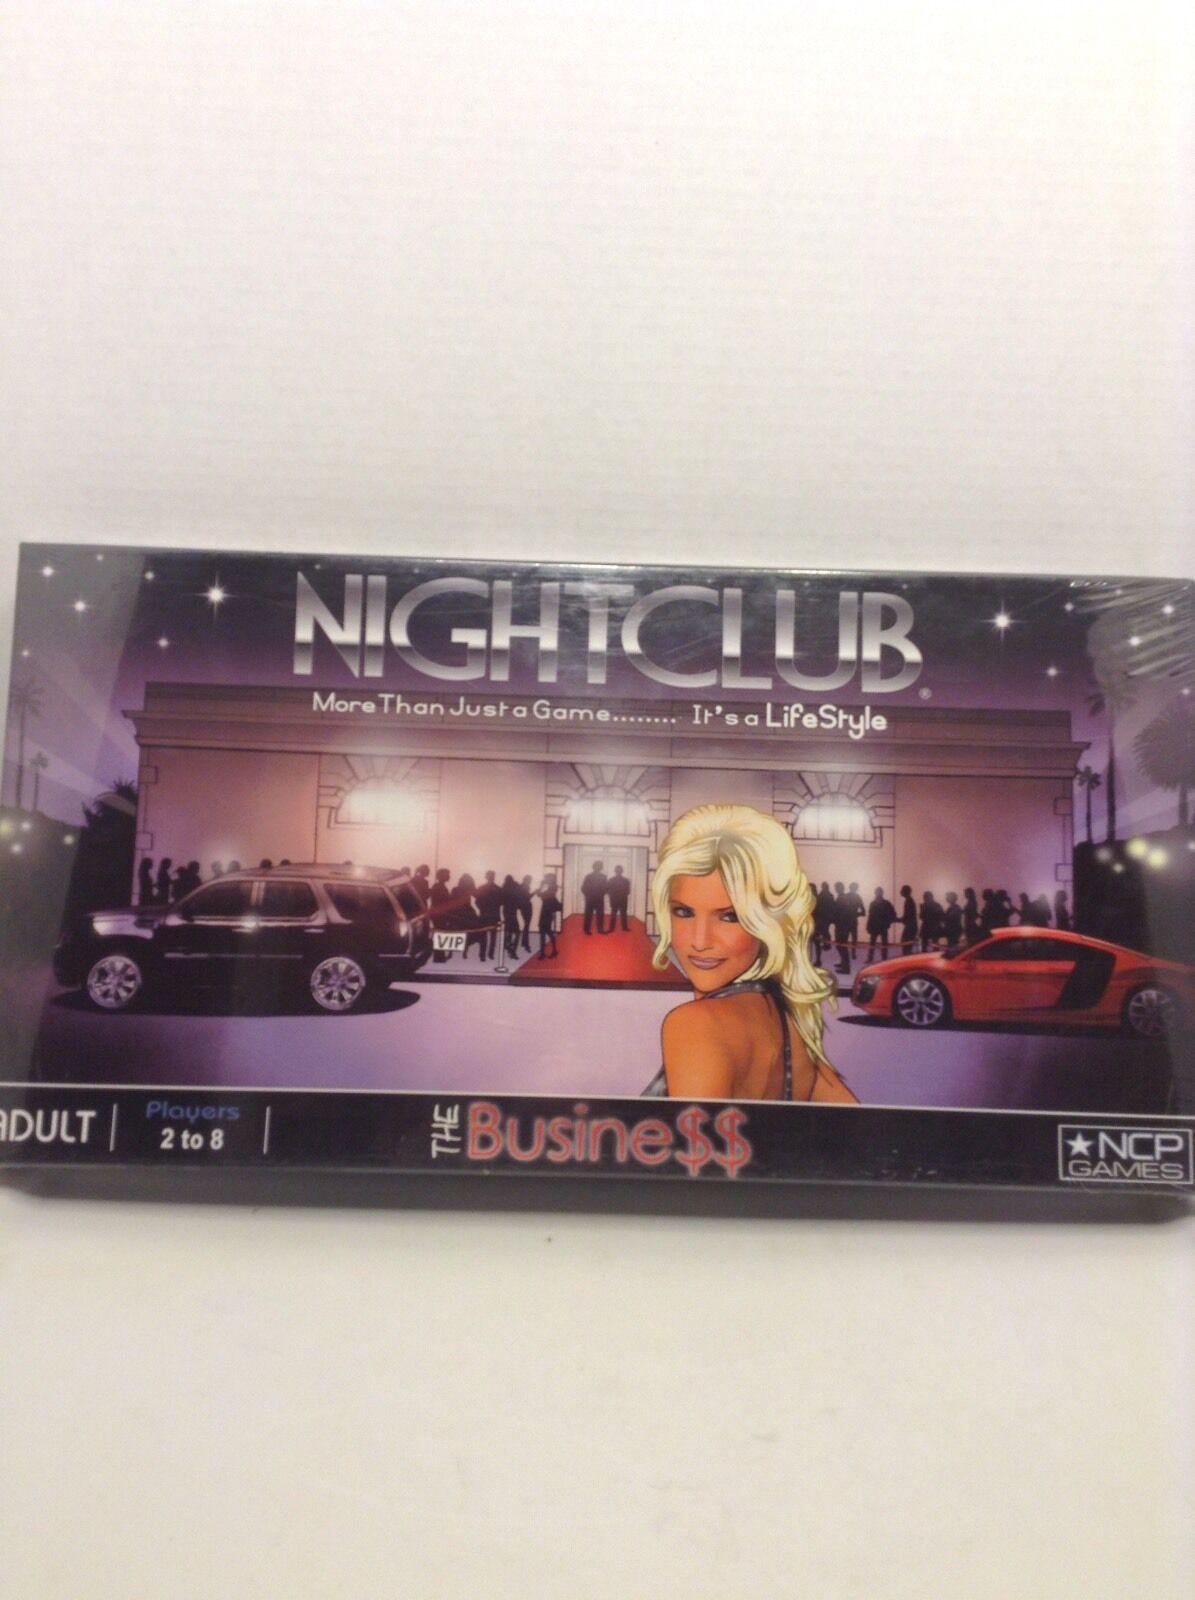 Nightclub The Geschäft Board Game NCP Games - New Sealed VHTF